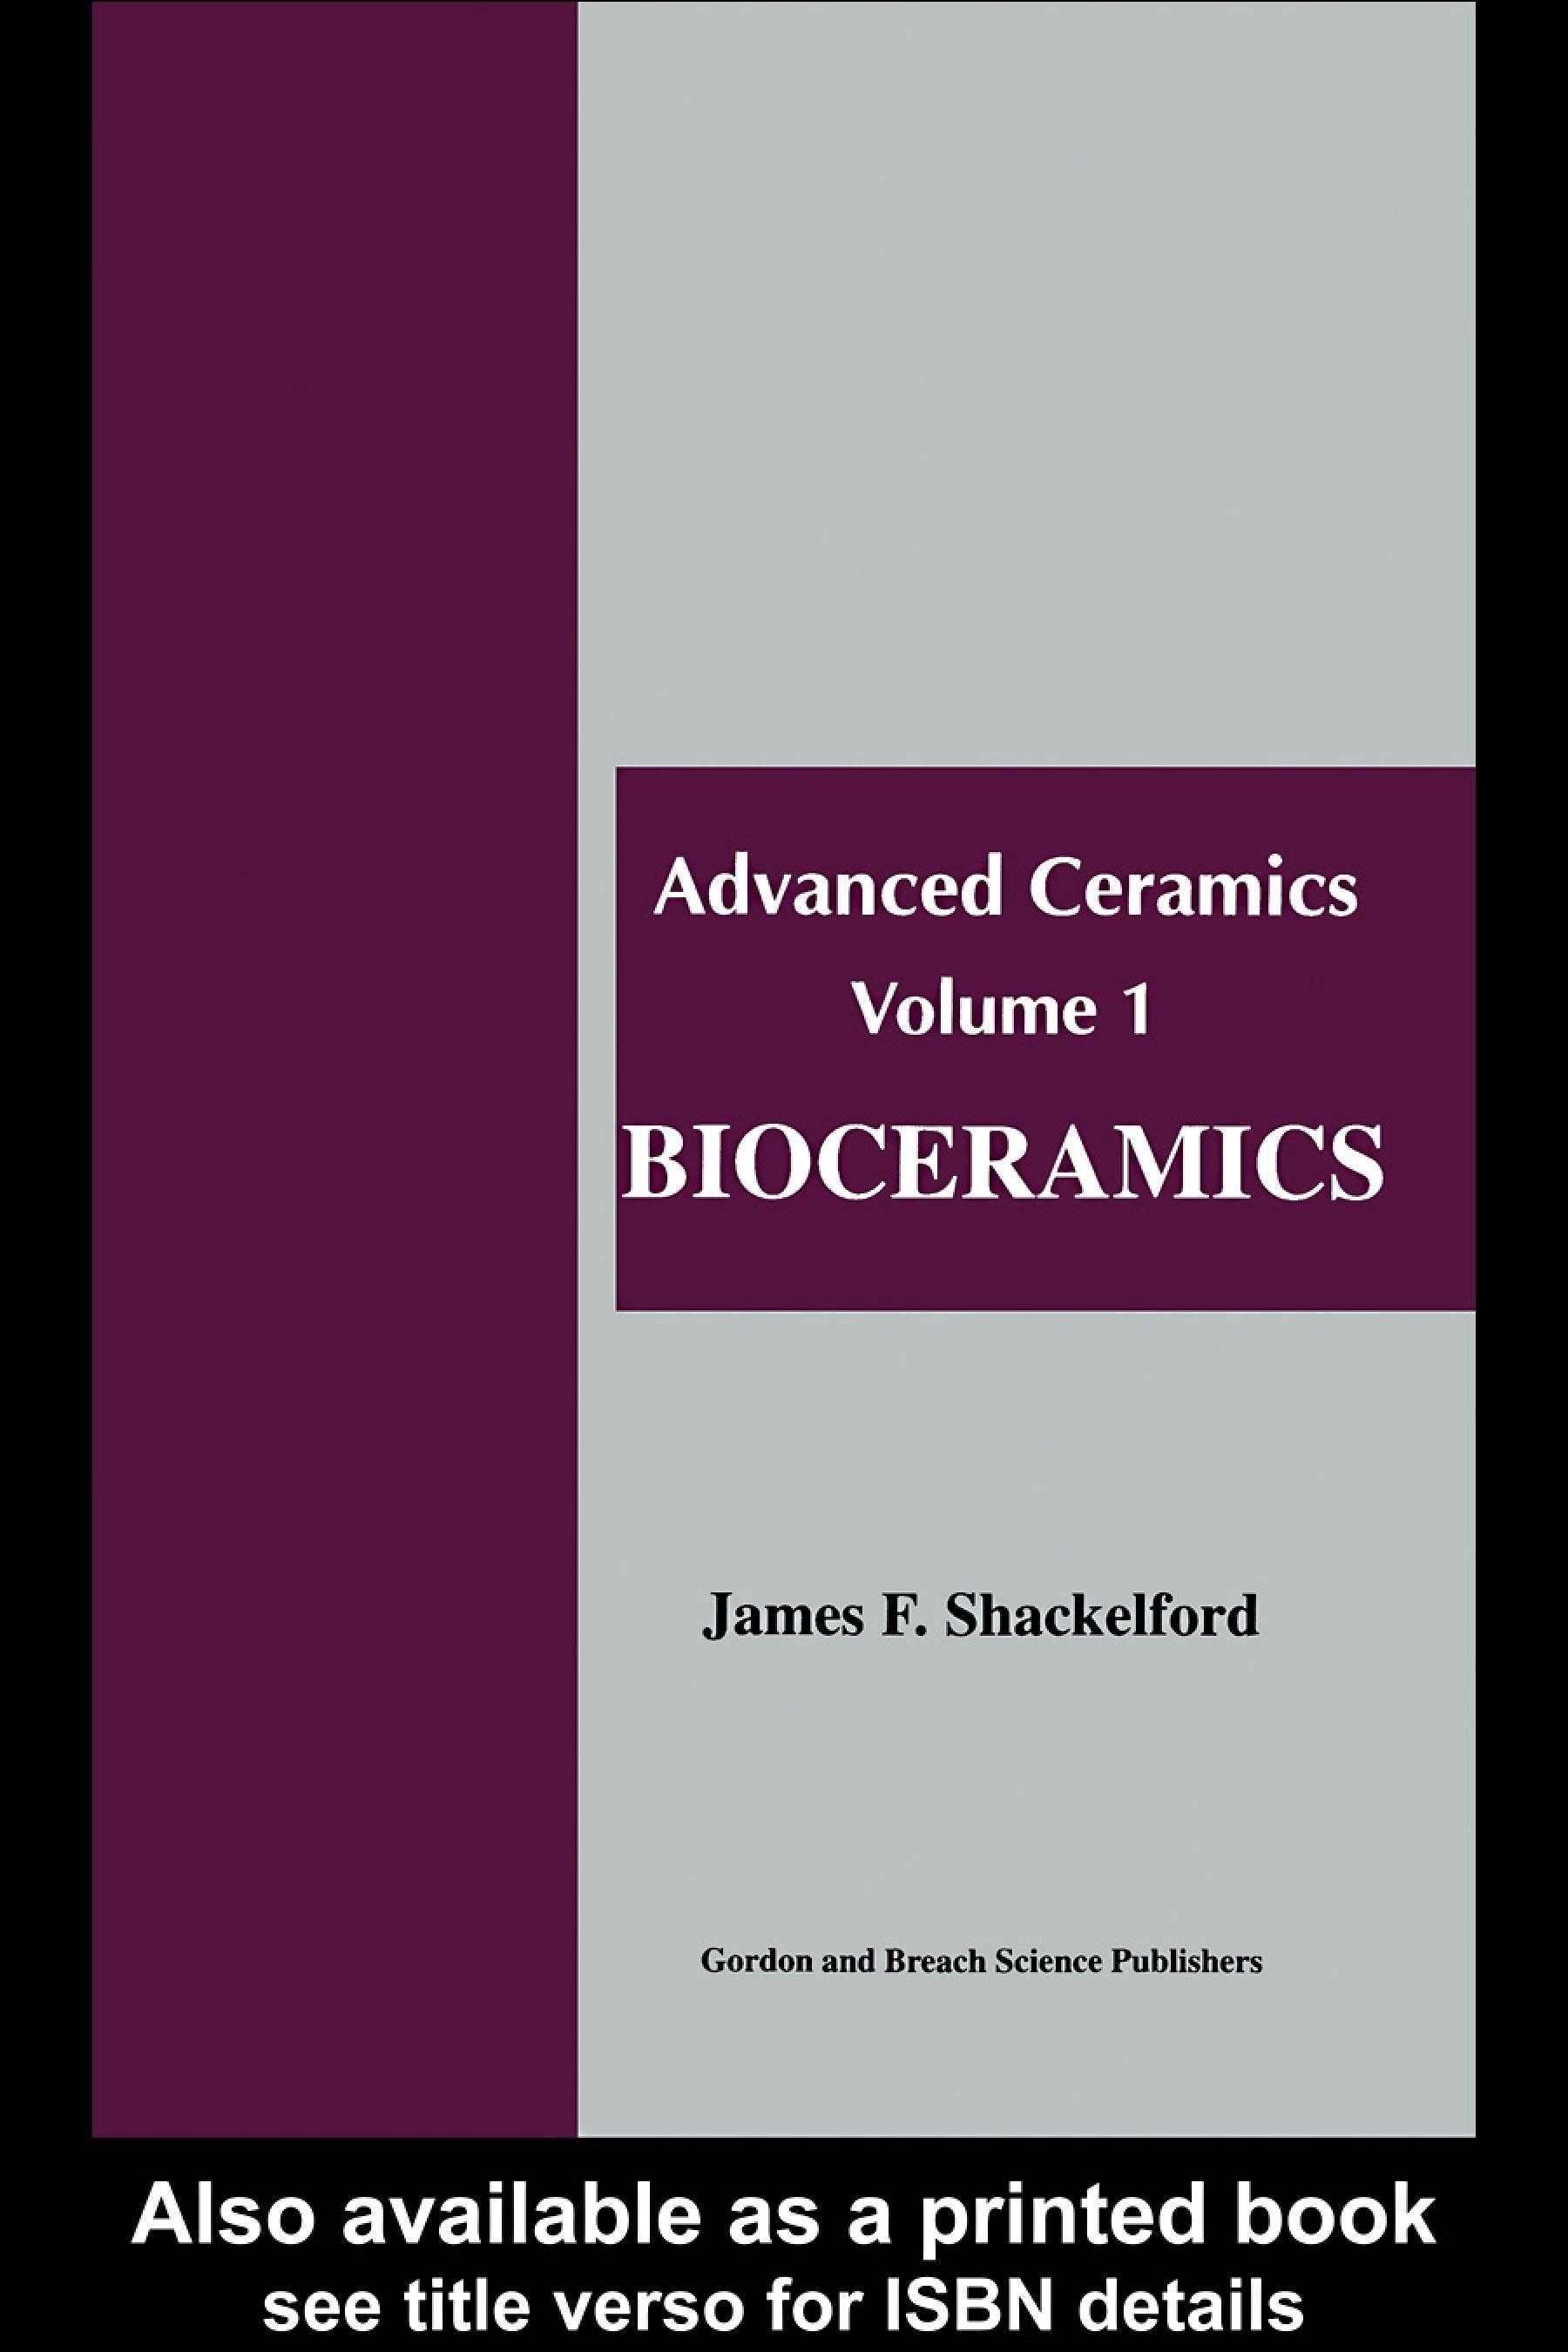 Bioceramics EB9780203304136